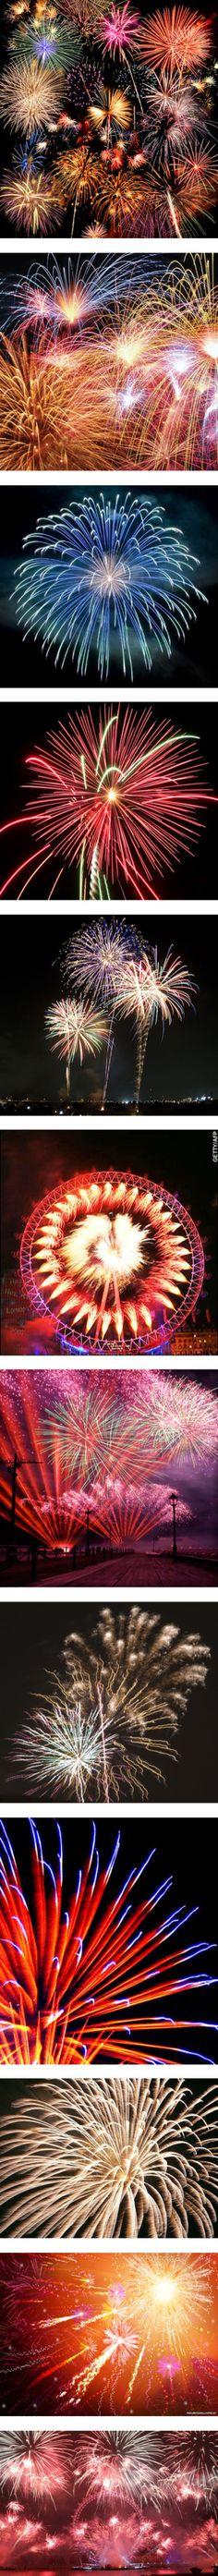 4th july fireworks uk